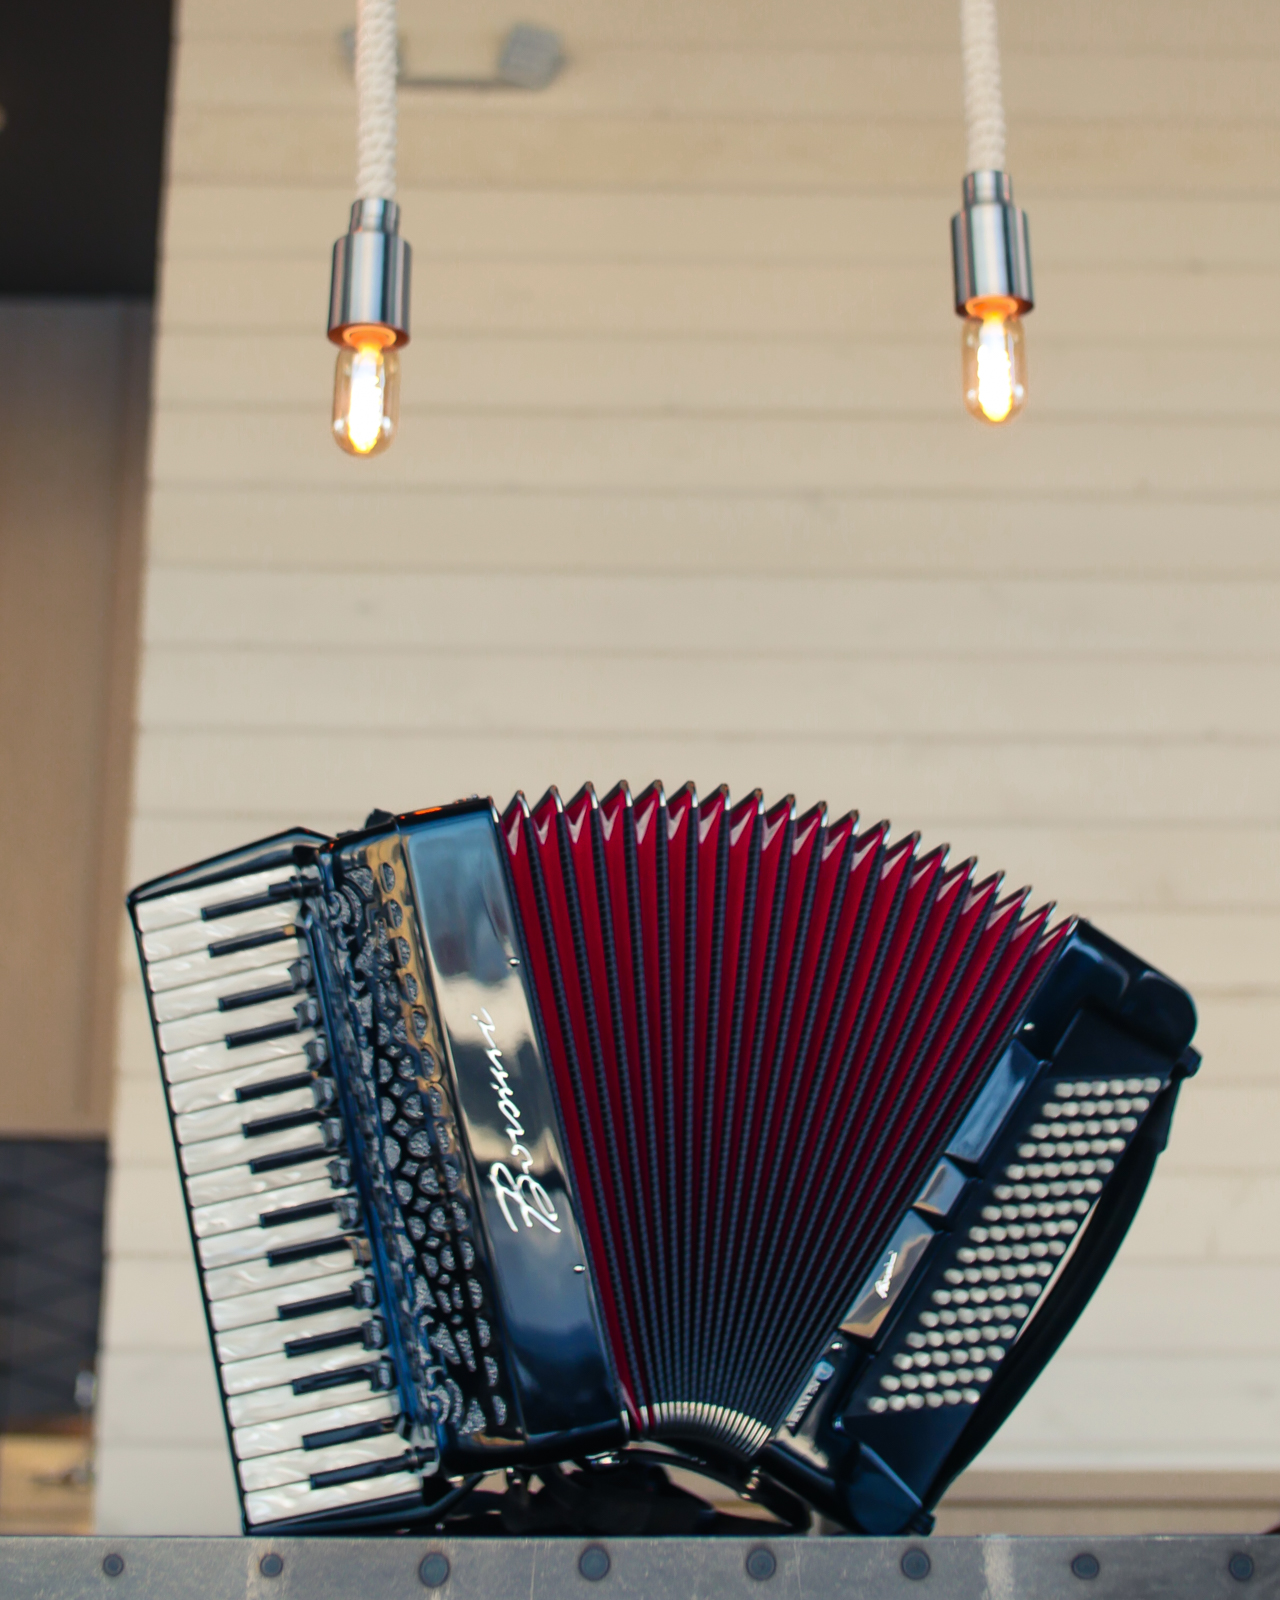 michael_schaeffer_accordion.jpg